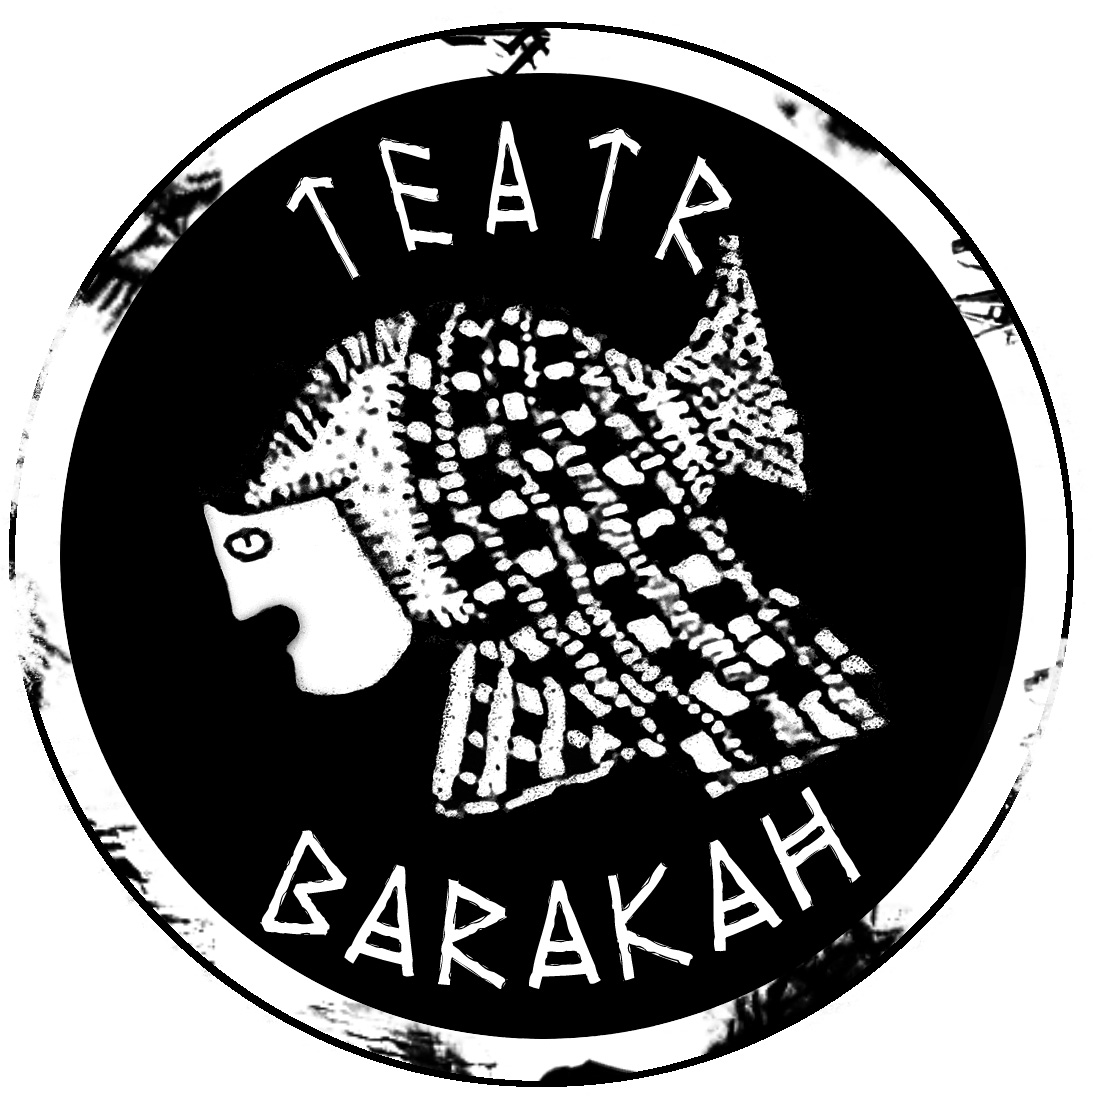 barakah logo kolko z tekstem